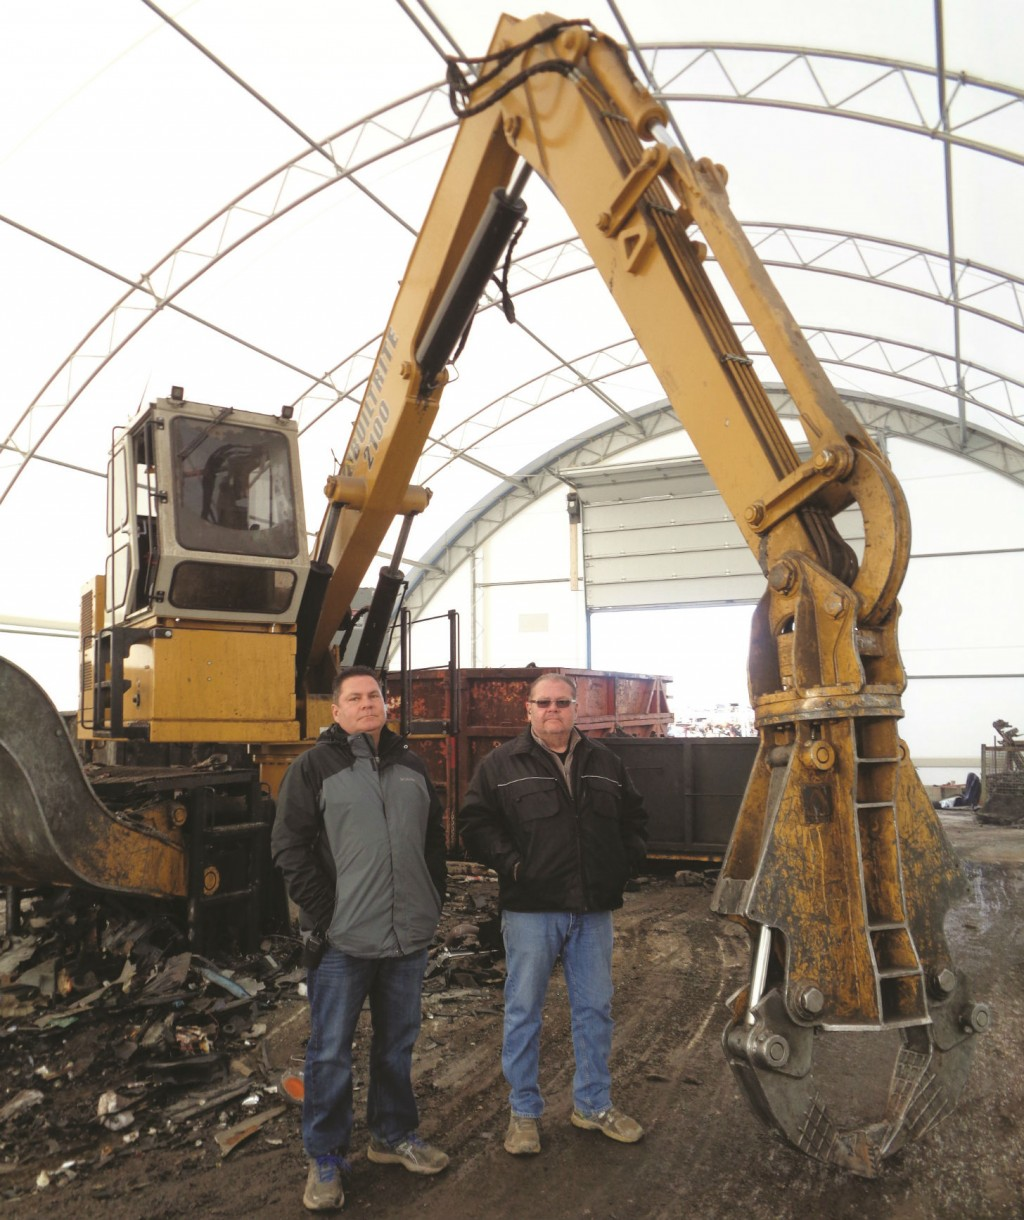 The McDonald brothers of Bodyline Auto Recyclers, Hamilton, Ontario.